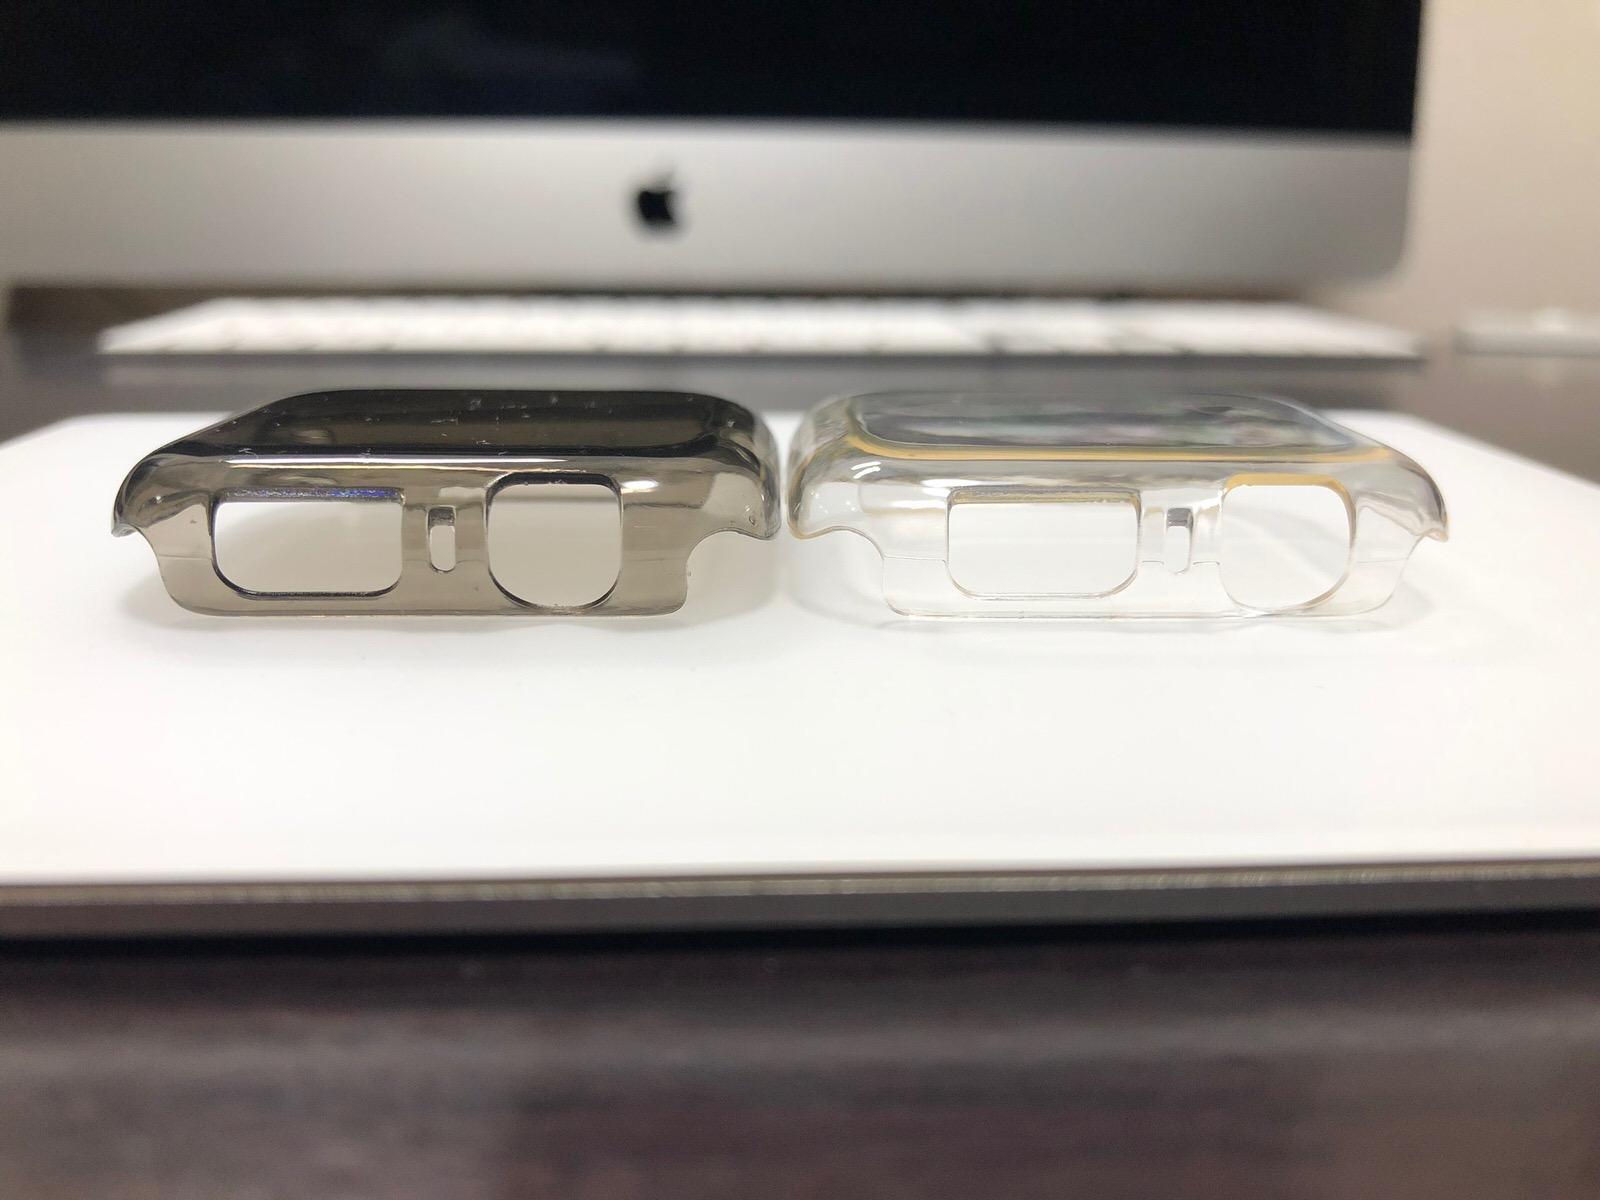 casualcatch Apple watch4 ケース 保護ケース カバー PCケース 傷を防止 防塵 耐衝撃性 44mm-4